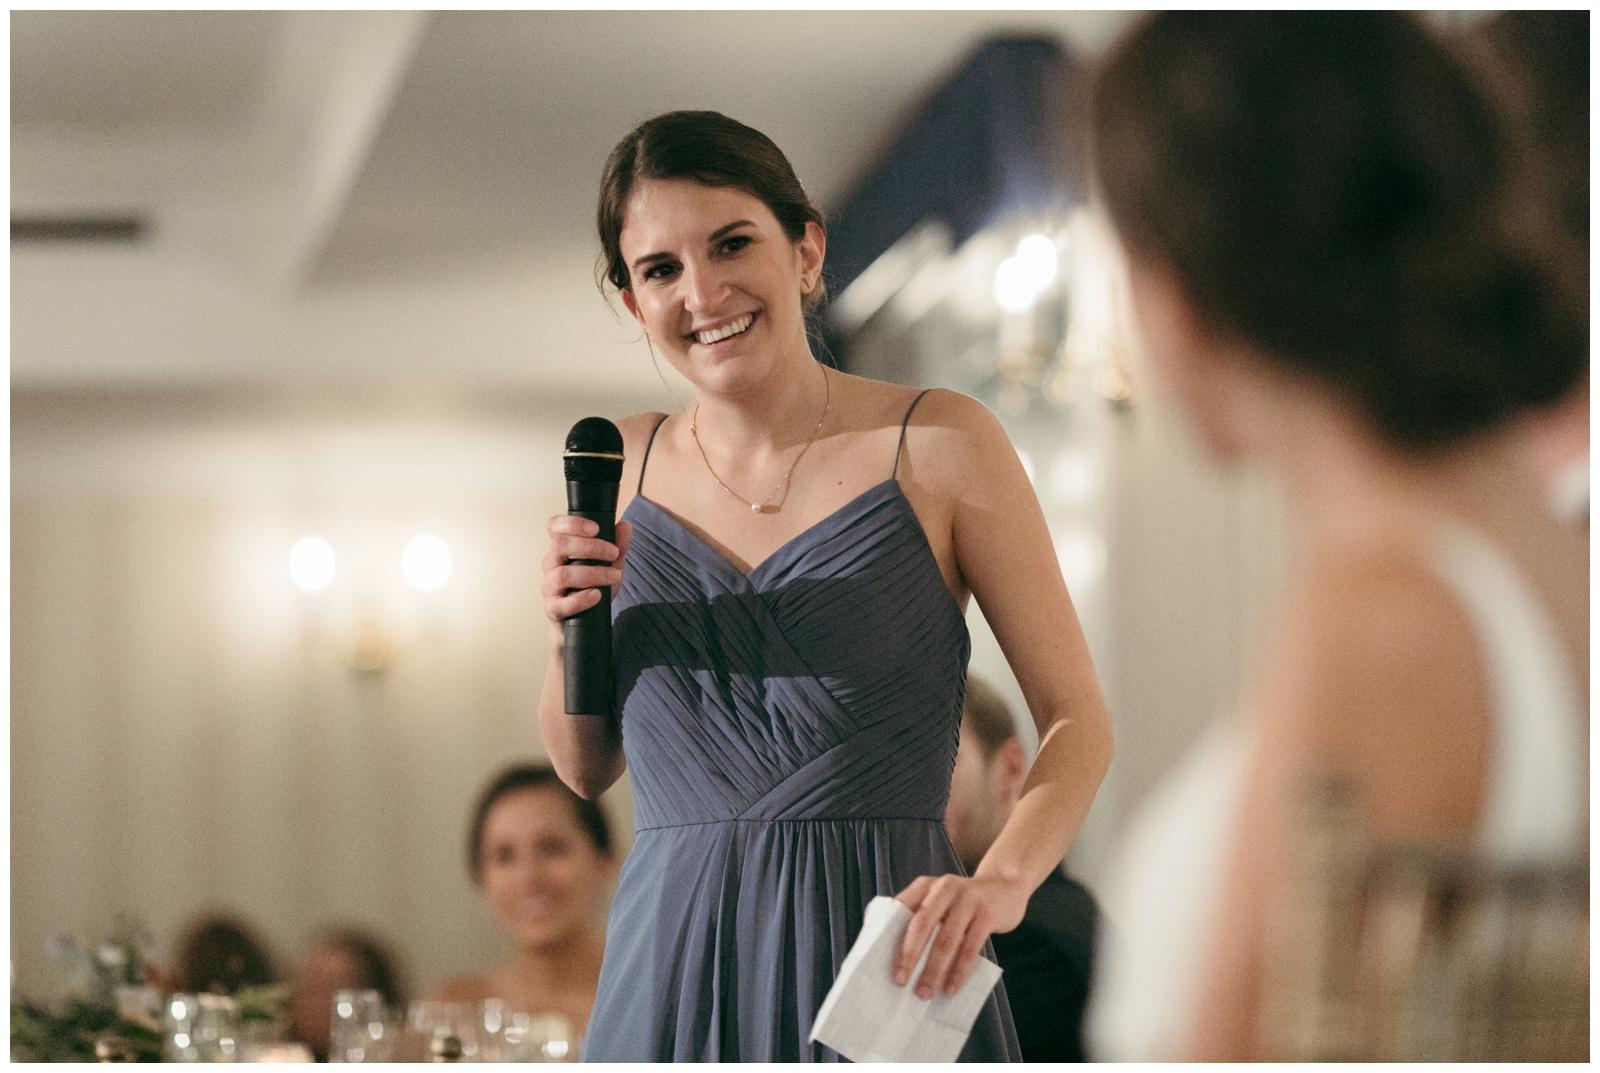 Madison-Beach-Hotel-Wedding-Bailey-Q-Photo-Boston-Wedding-Photographer-064.jpg